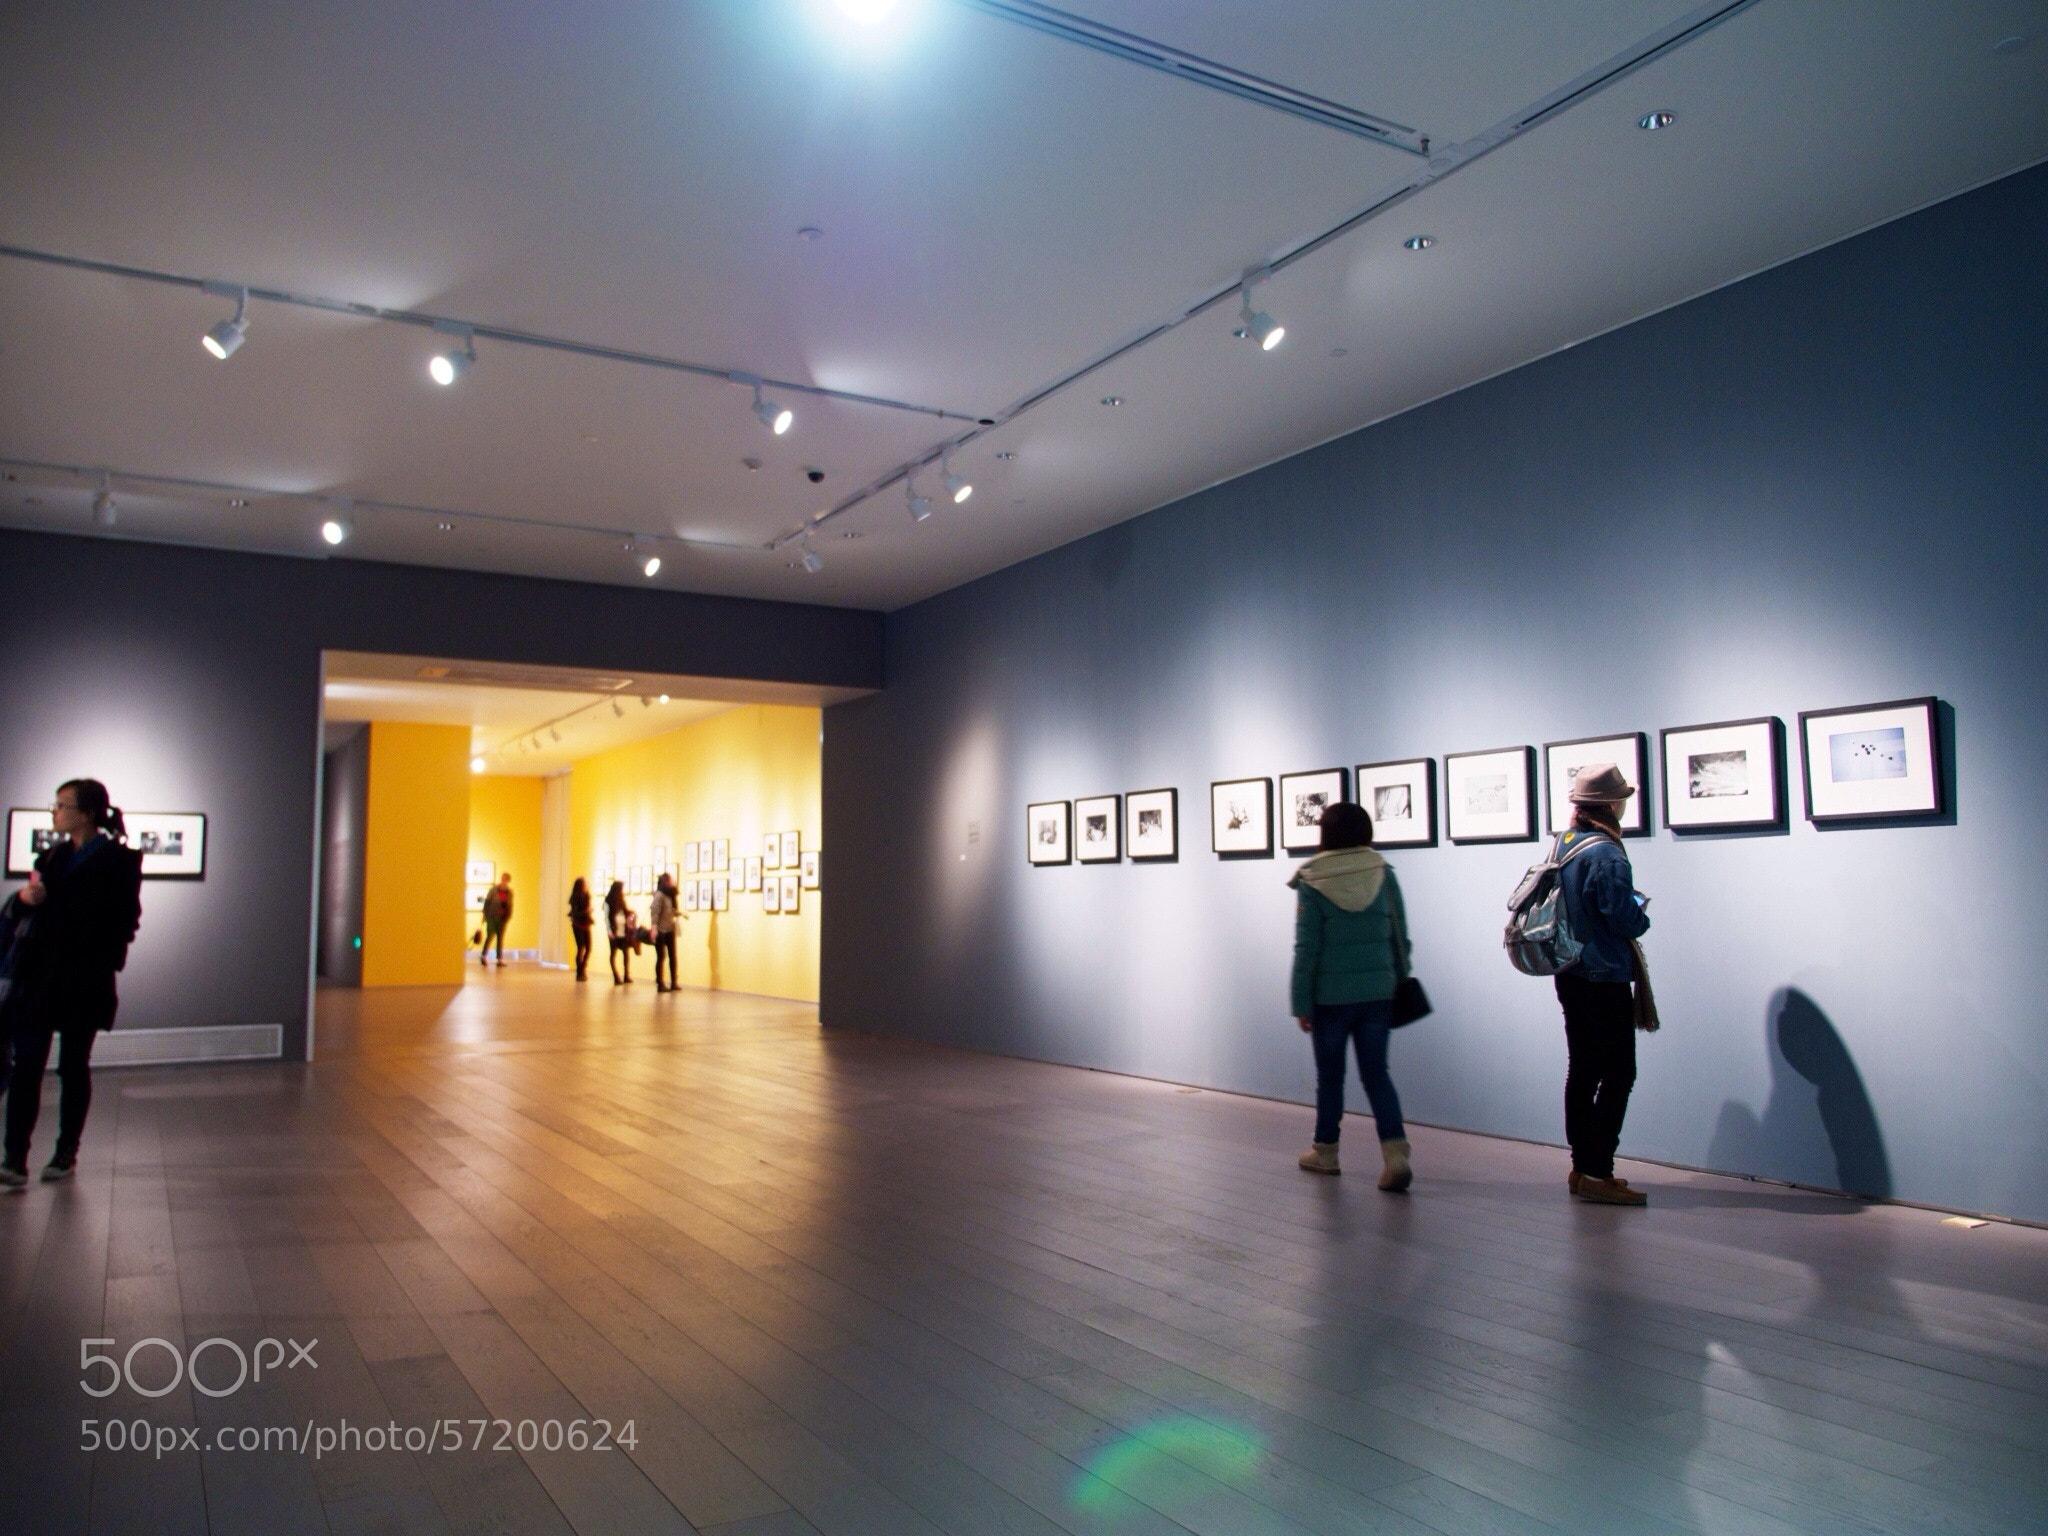 Photograph 荒木经惟 by lin lv on 500px